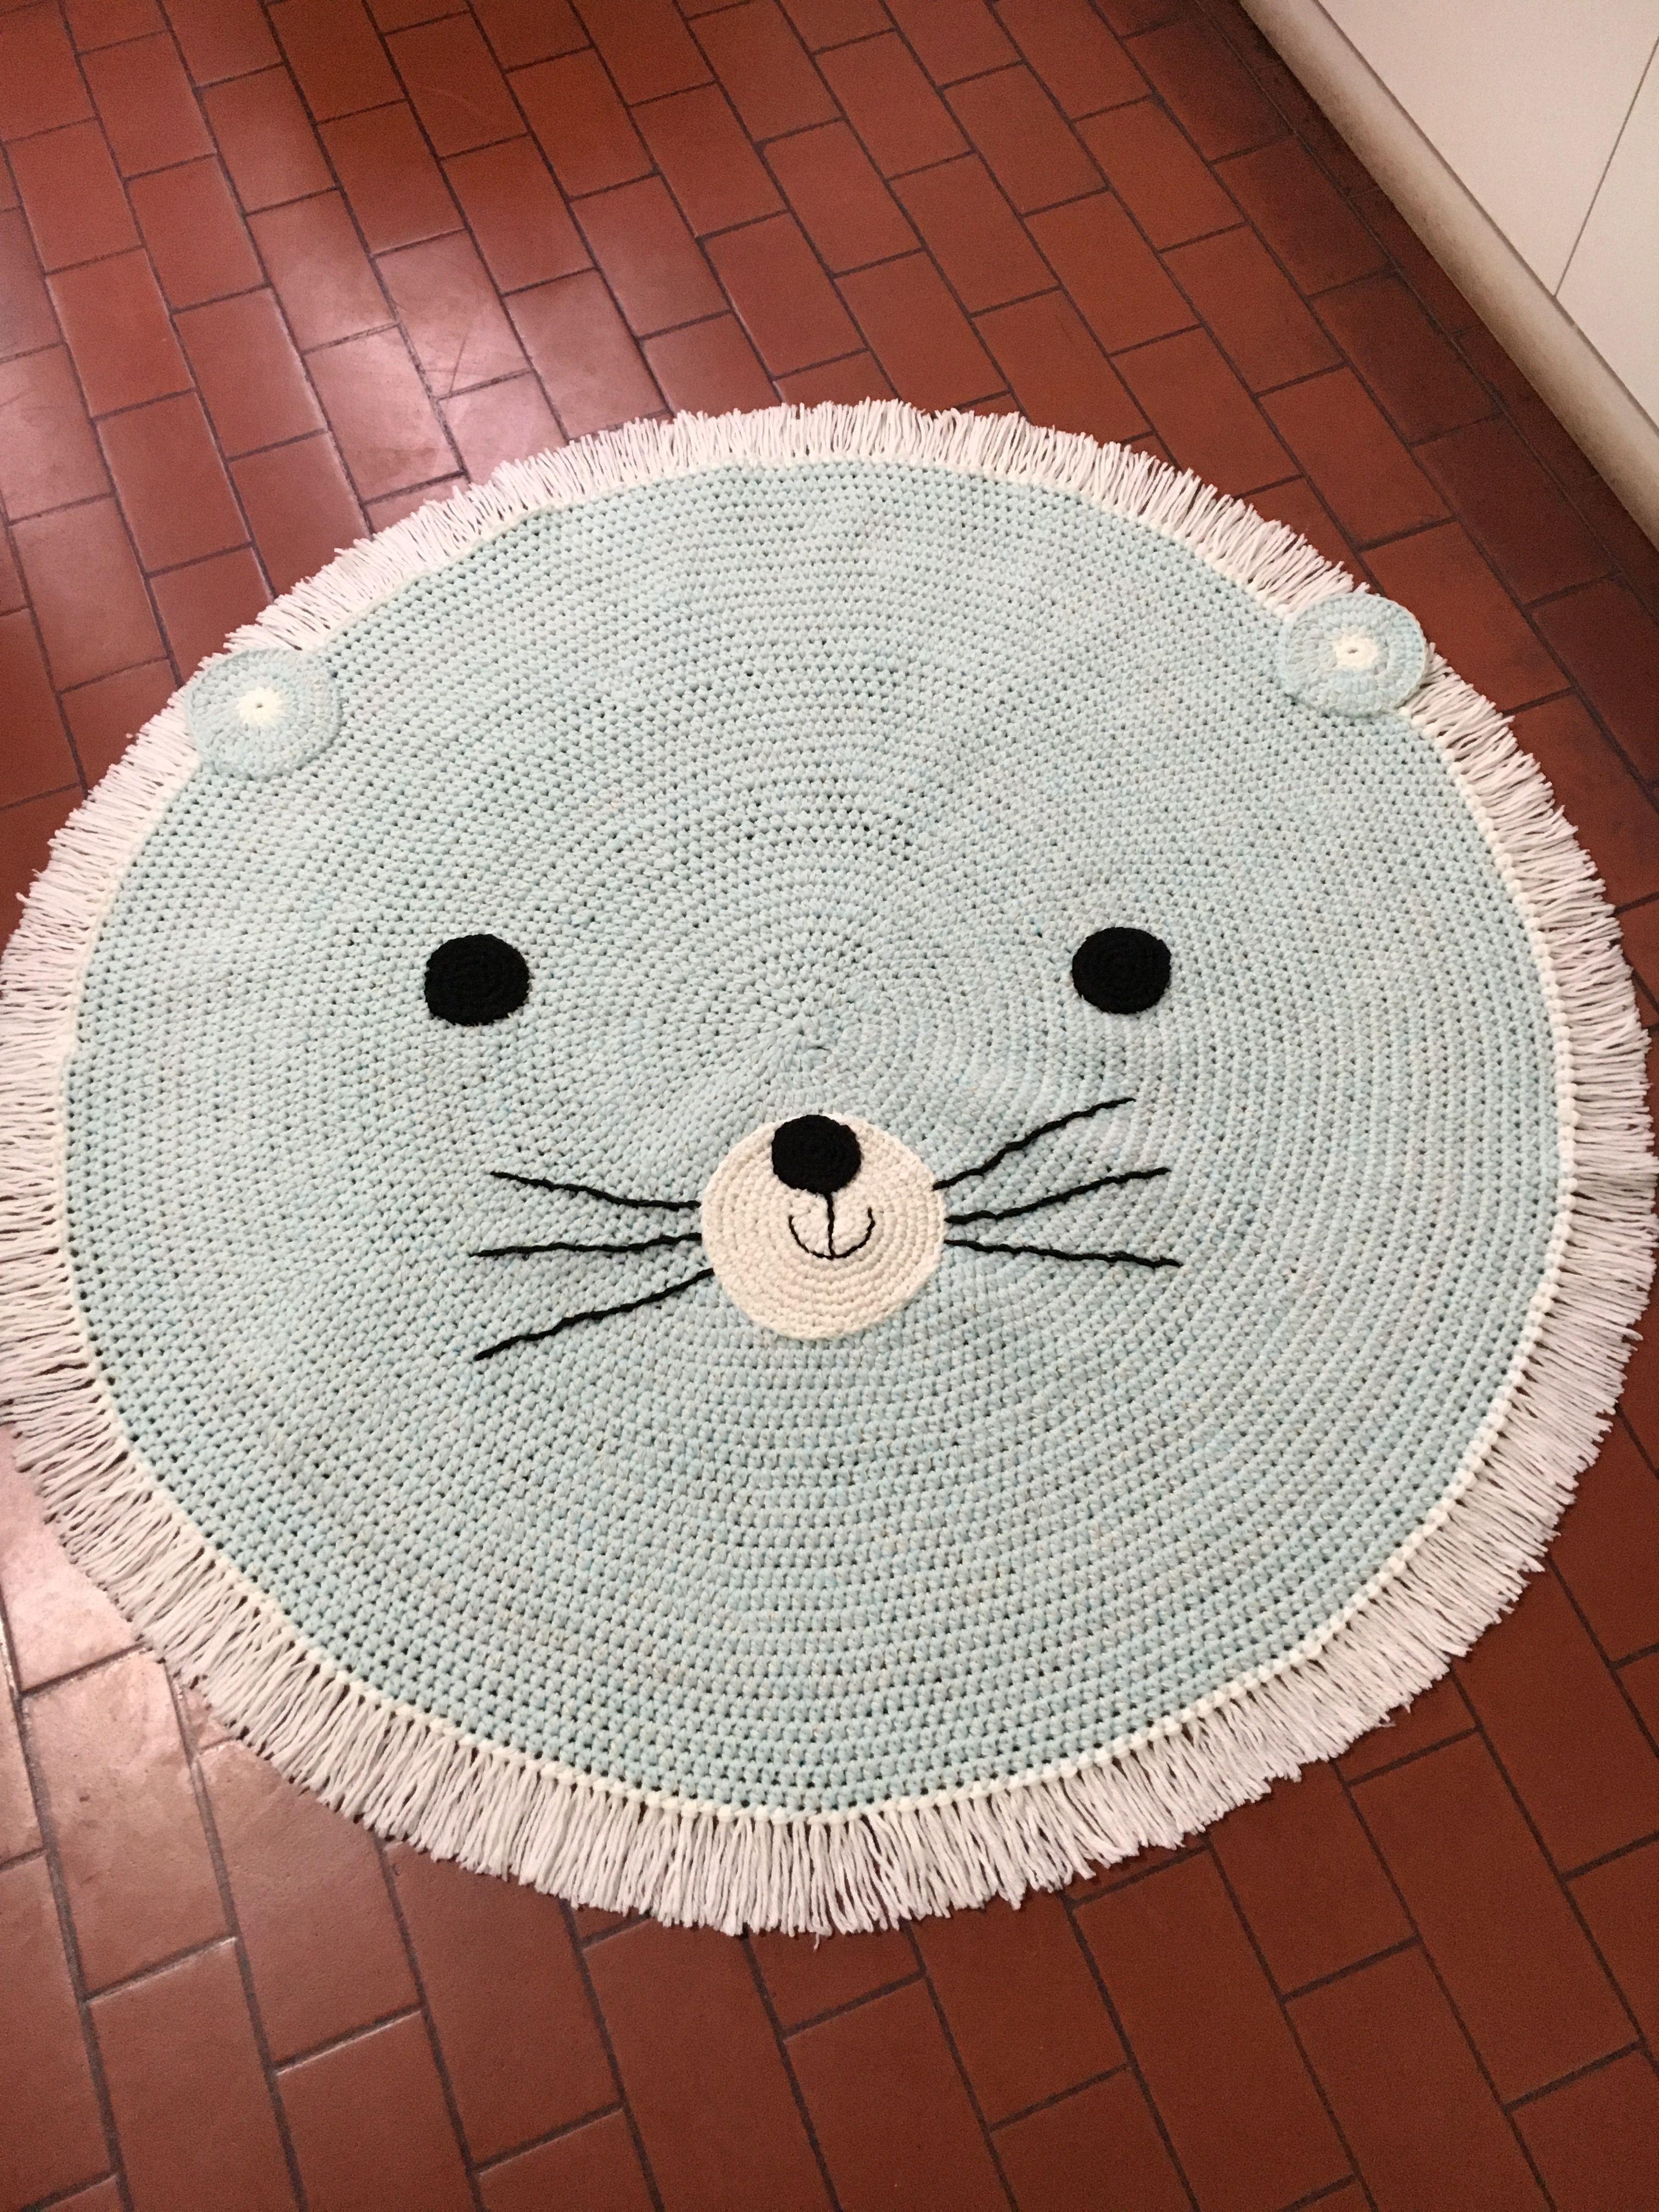 Pin de Iaia en Crochet | Pinterest